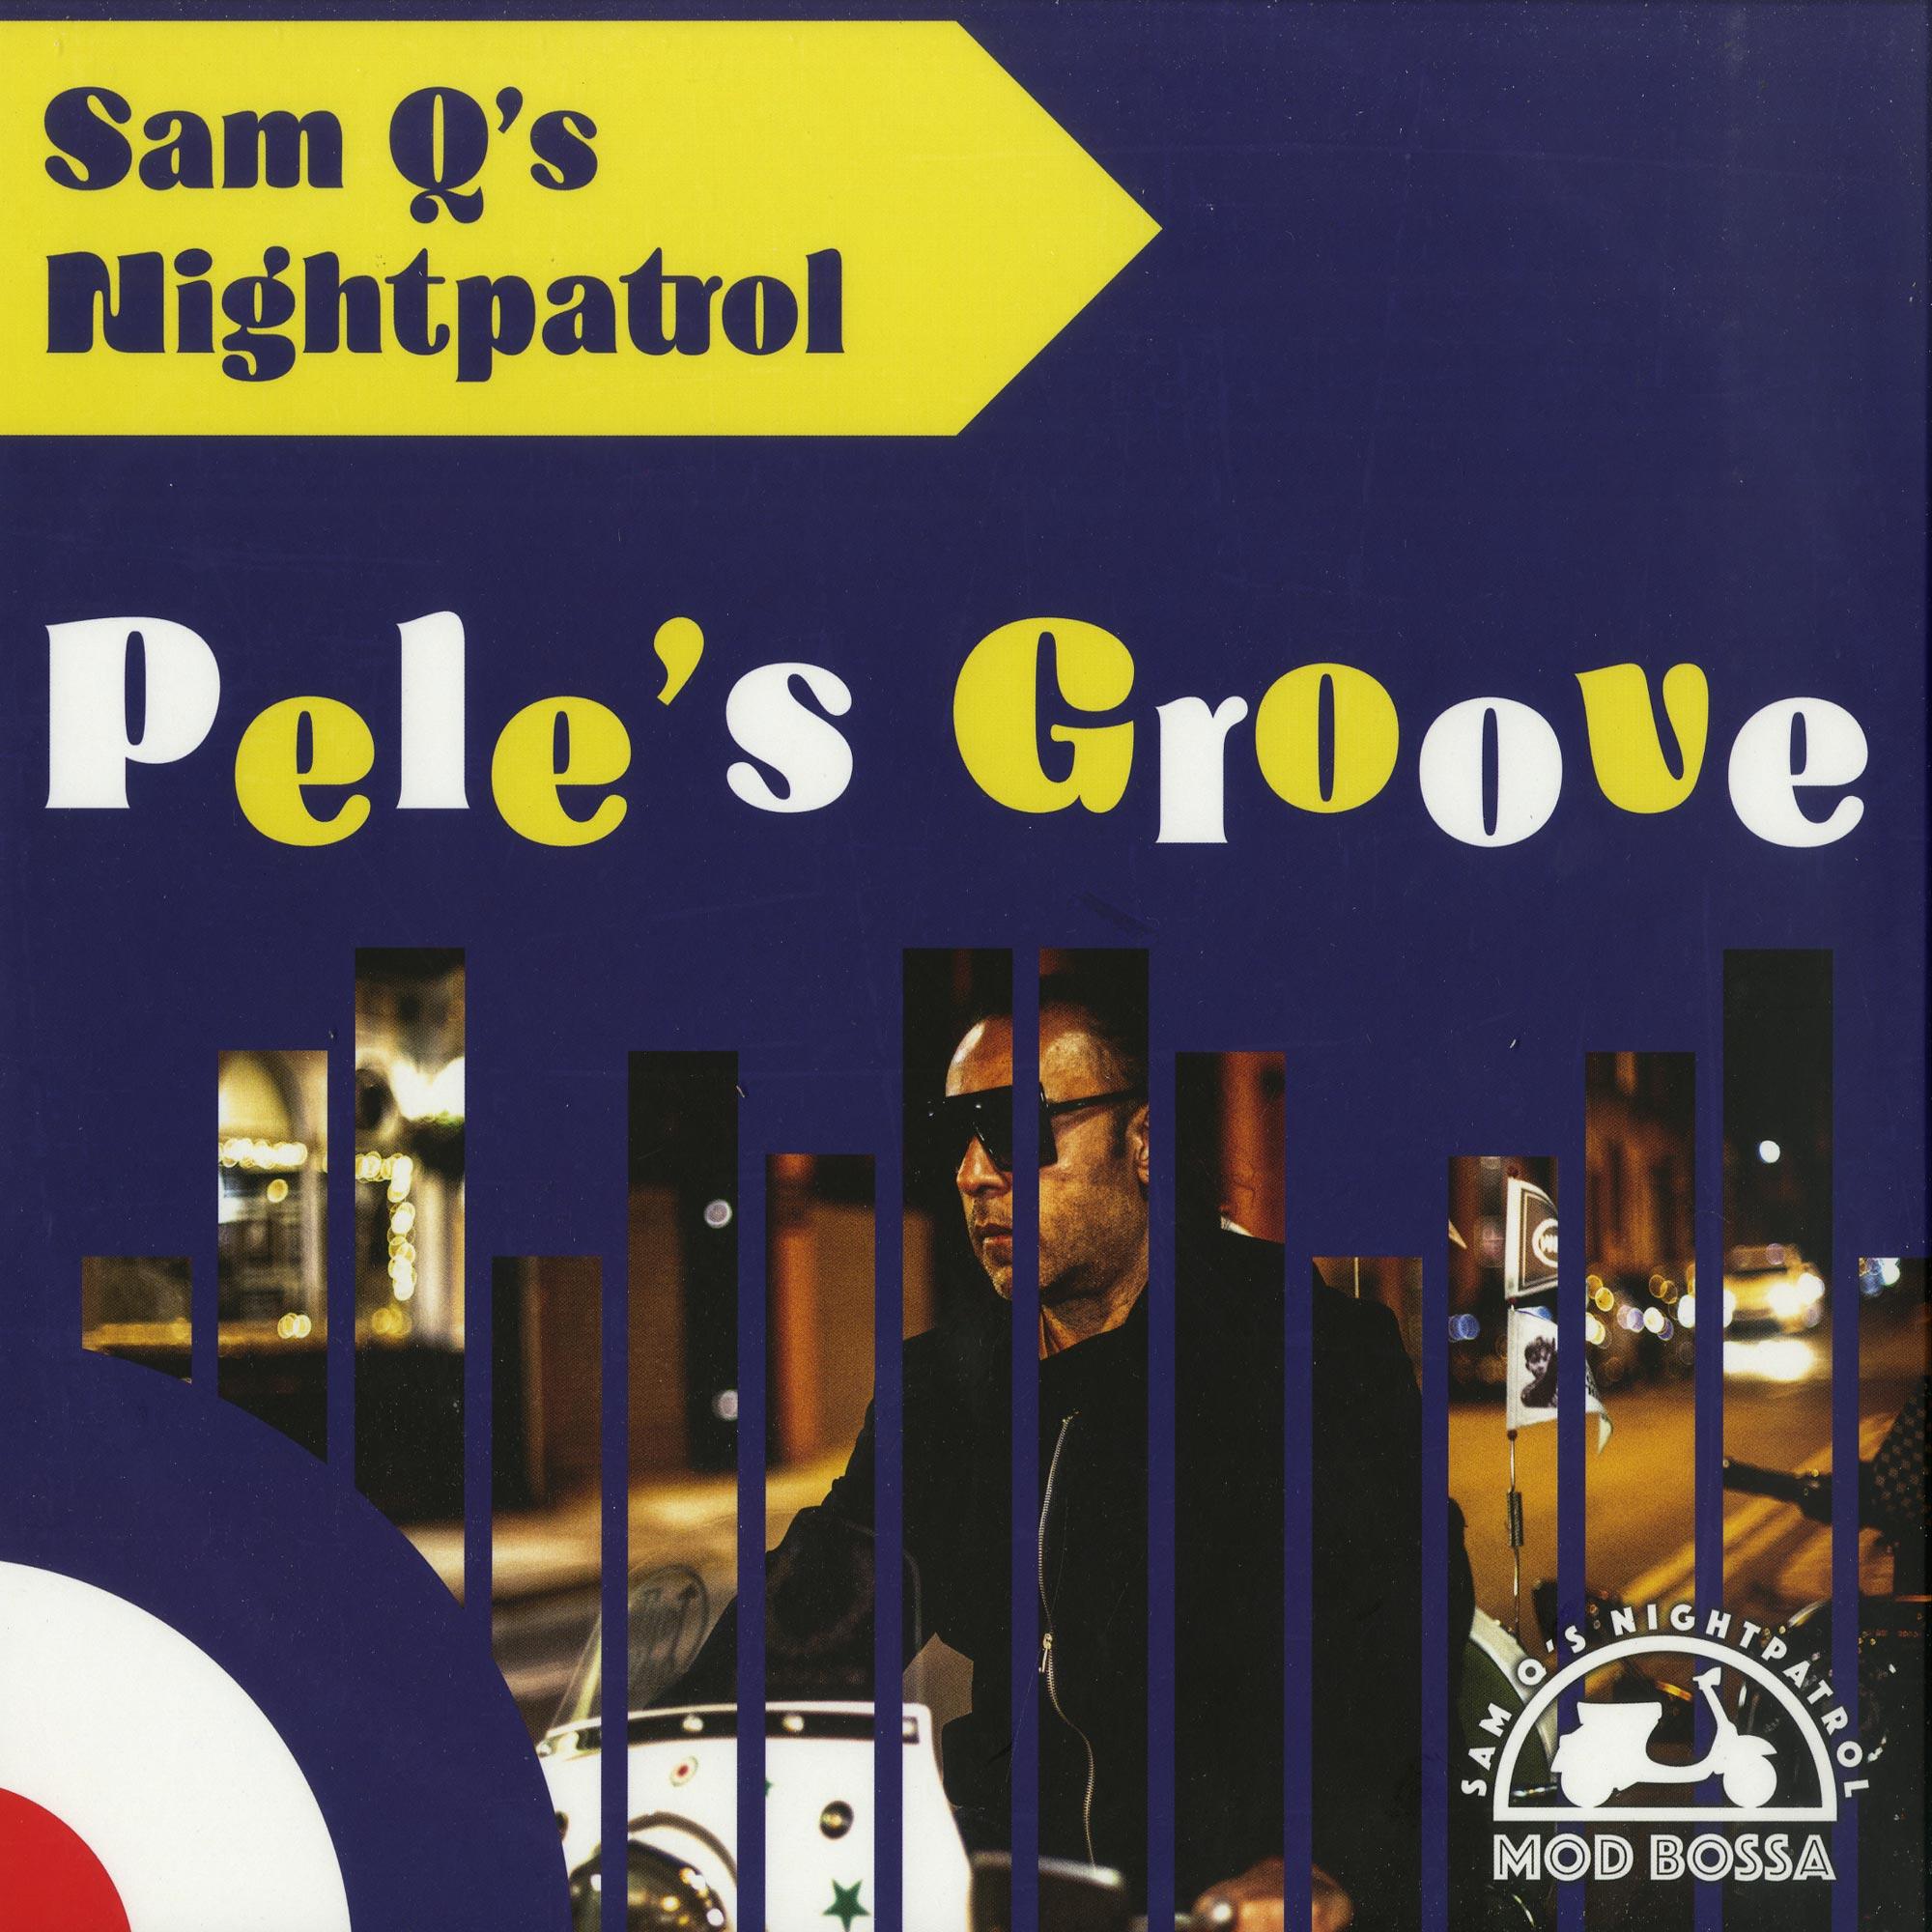 Sam Qs Night Patrol - PELES GROOVE EP